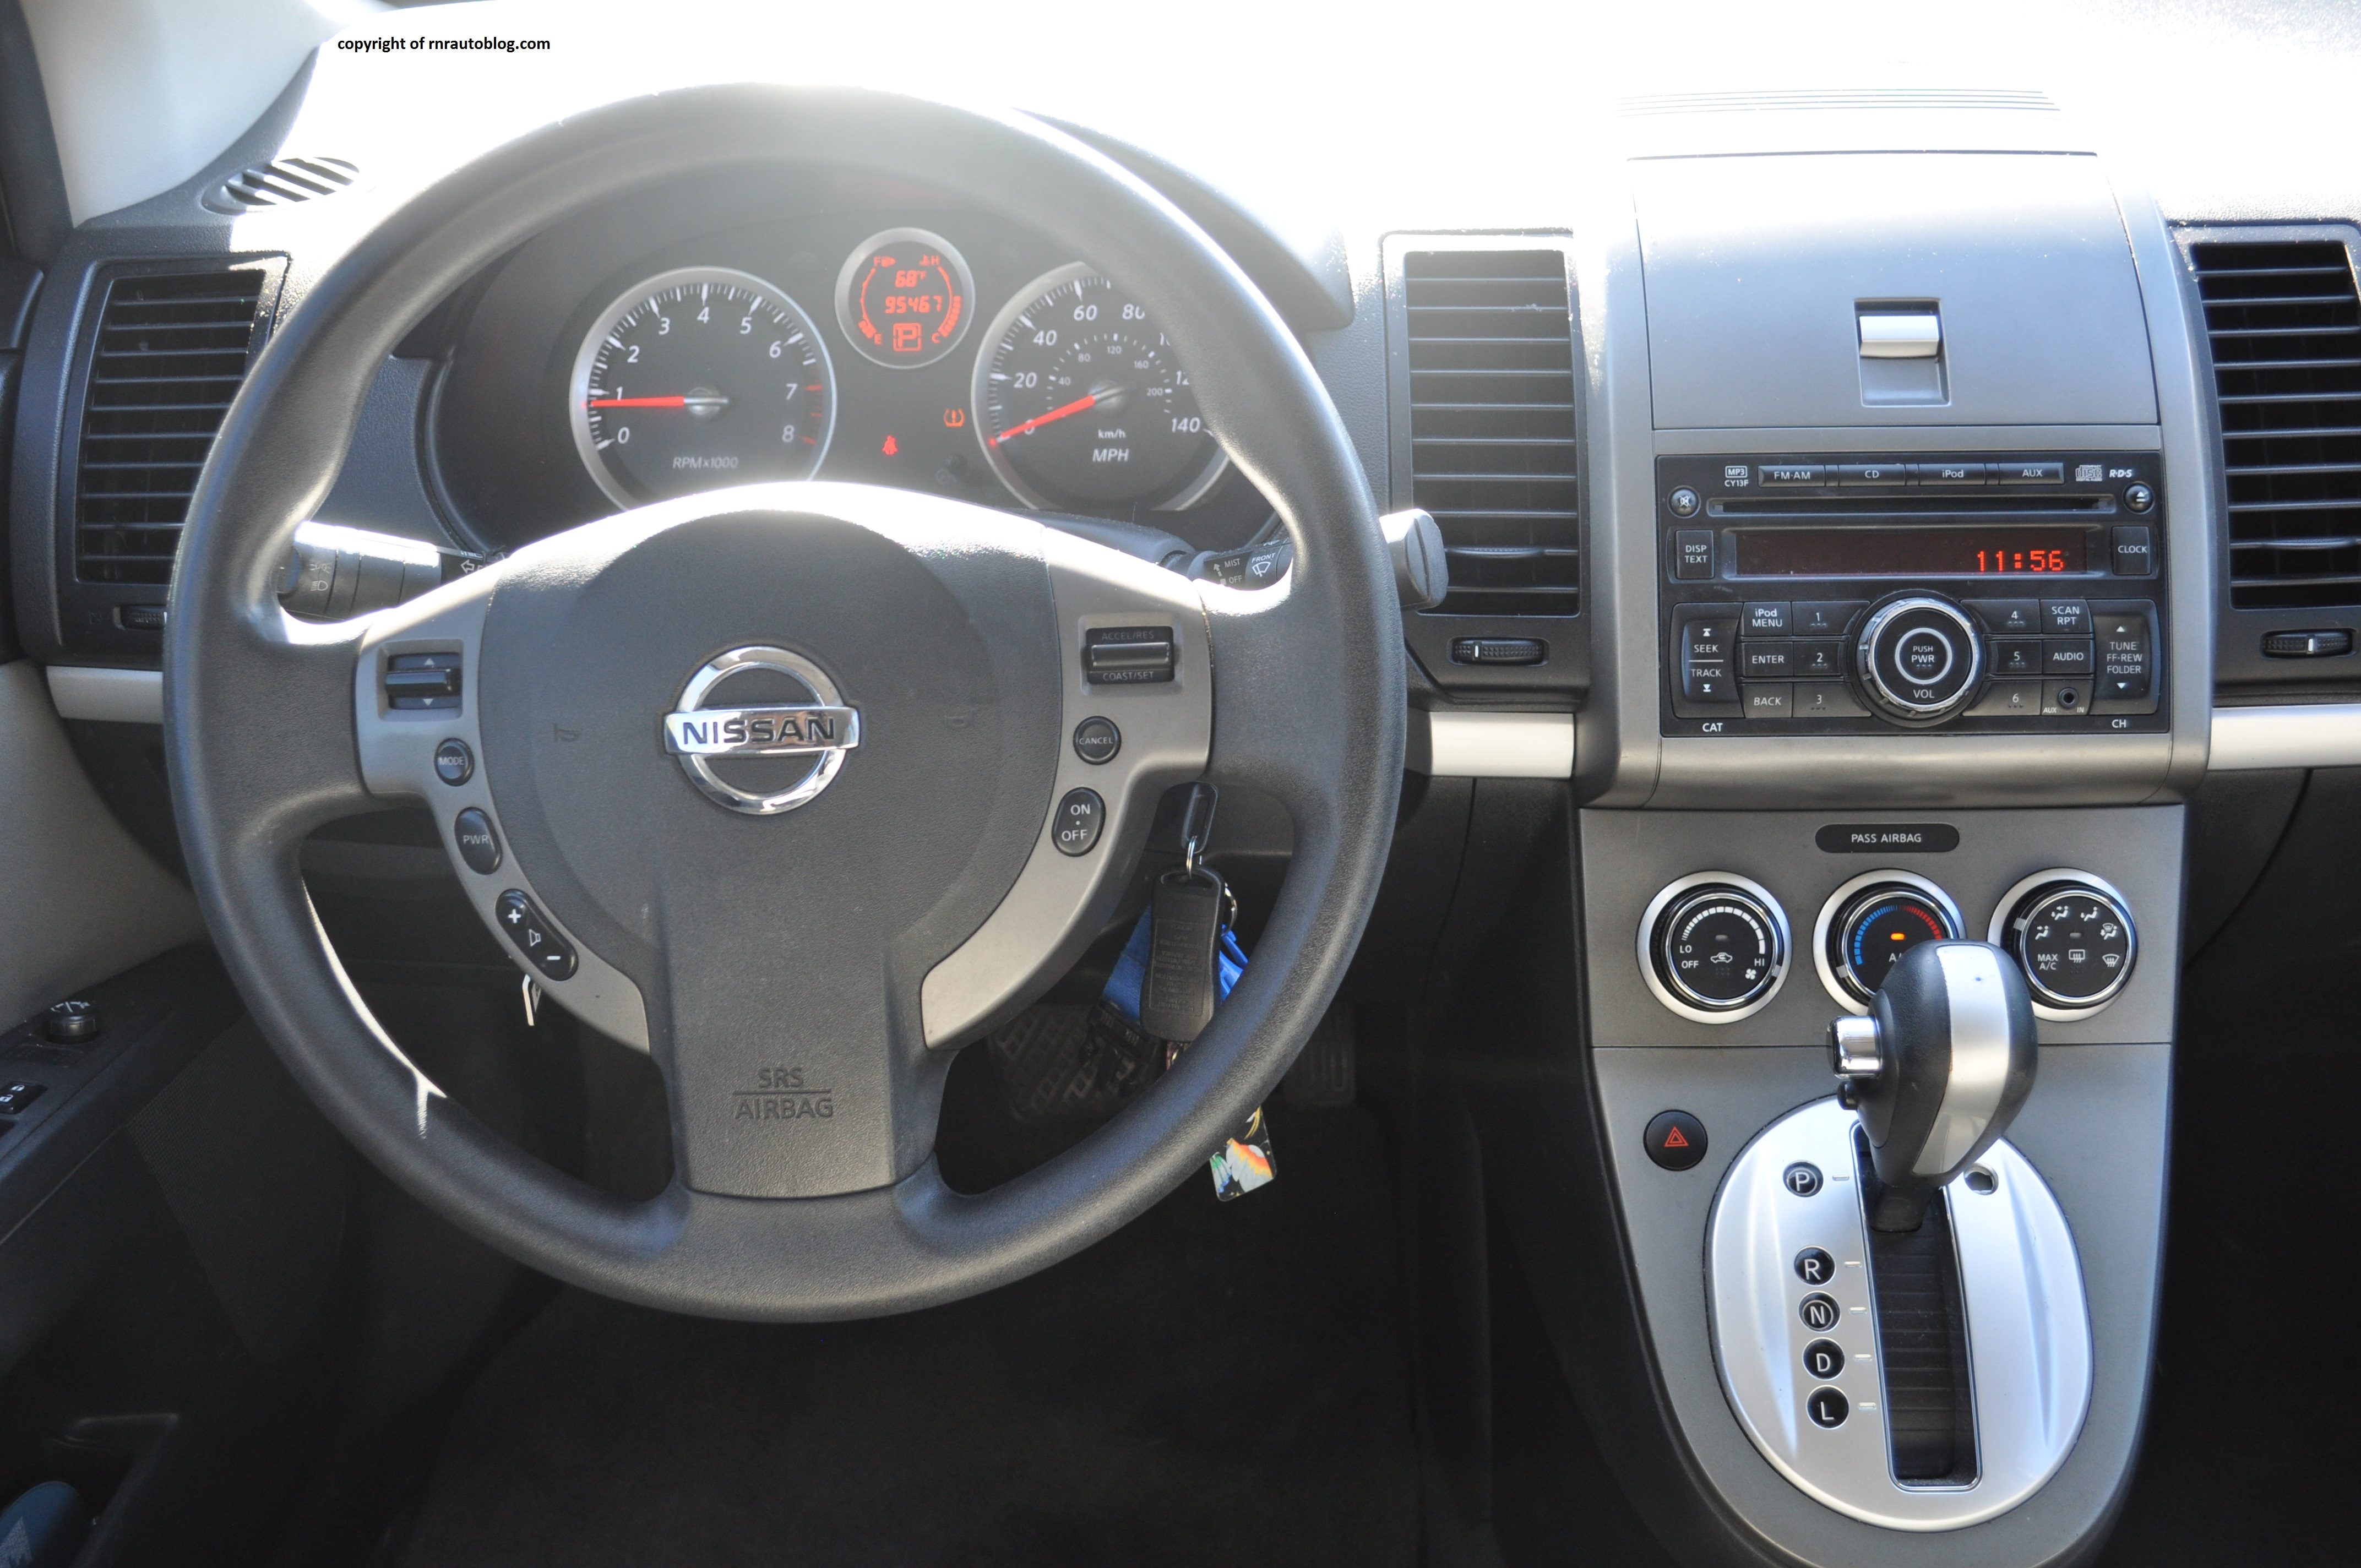 2014 Nissan Altima Interior 2009 Nissan Altima Coupe 2 5 S Review Rnr Automotive Blog 2010